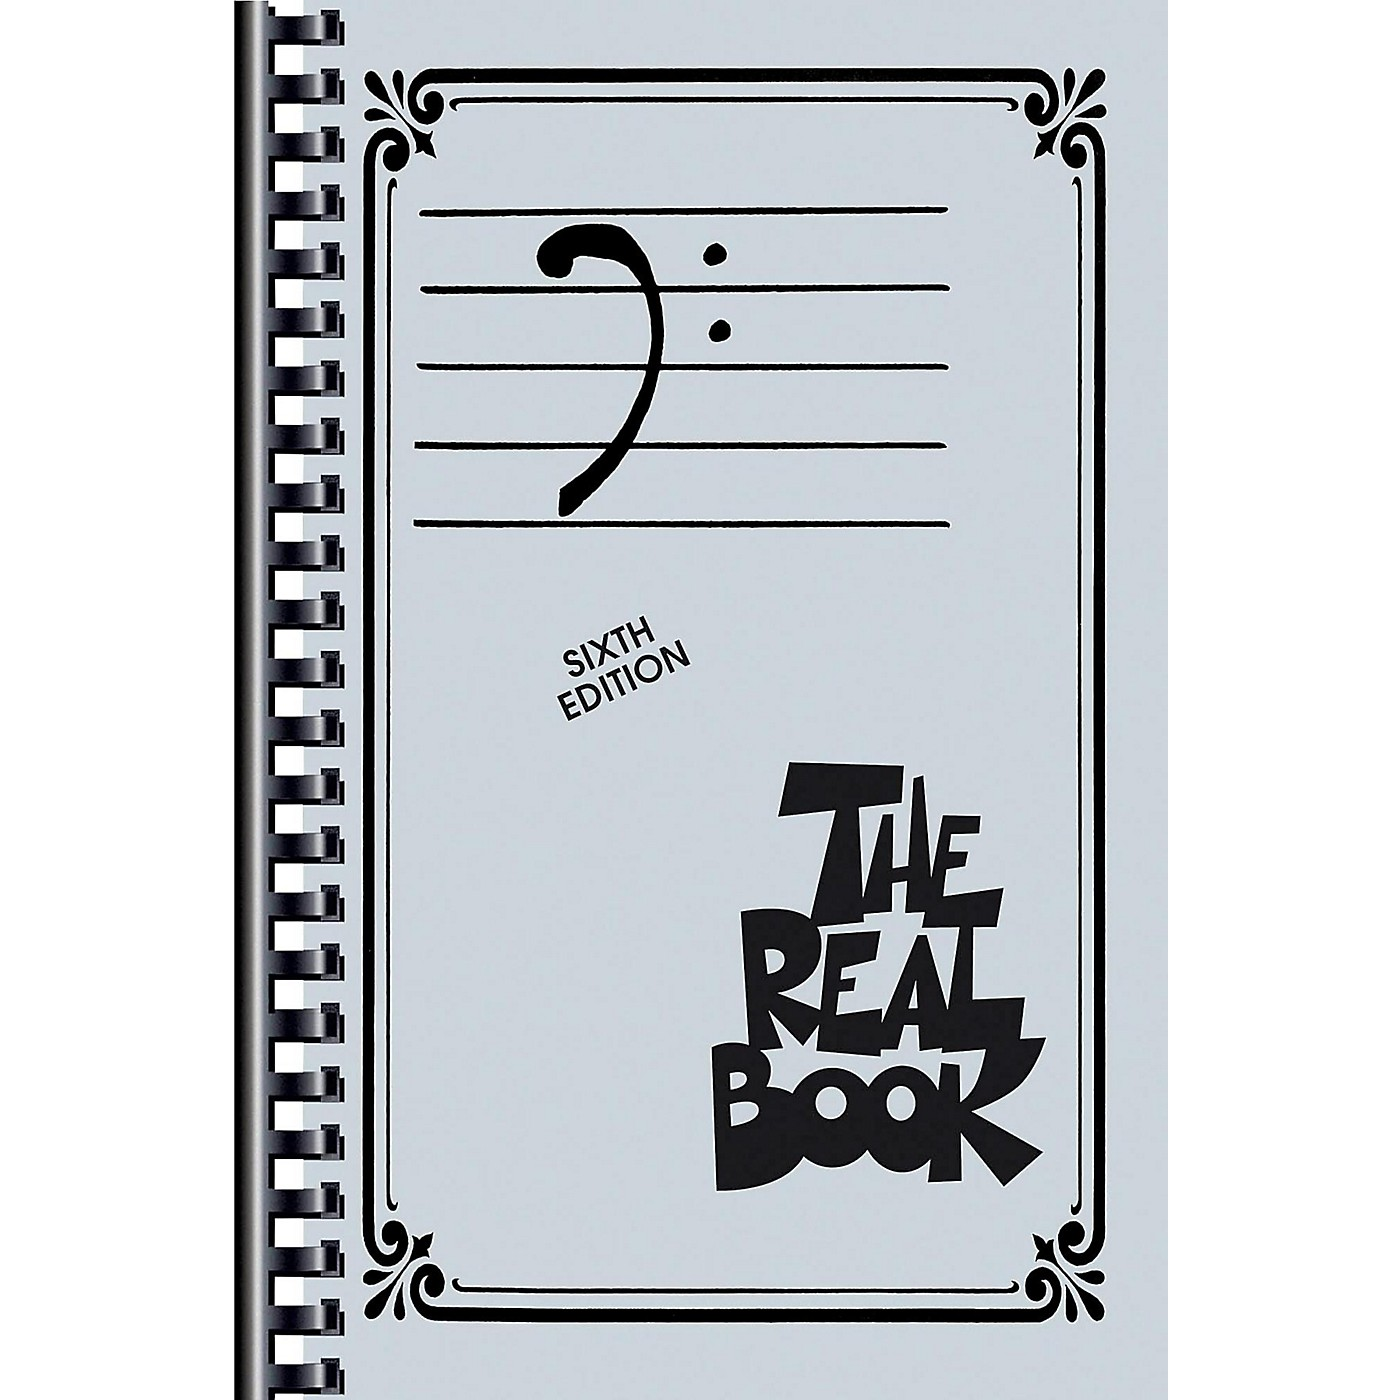 Hal Leonard The Real Book Volume 1 (Bass Clef Edition) - Mini Size thumbnail